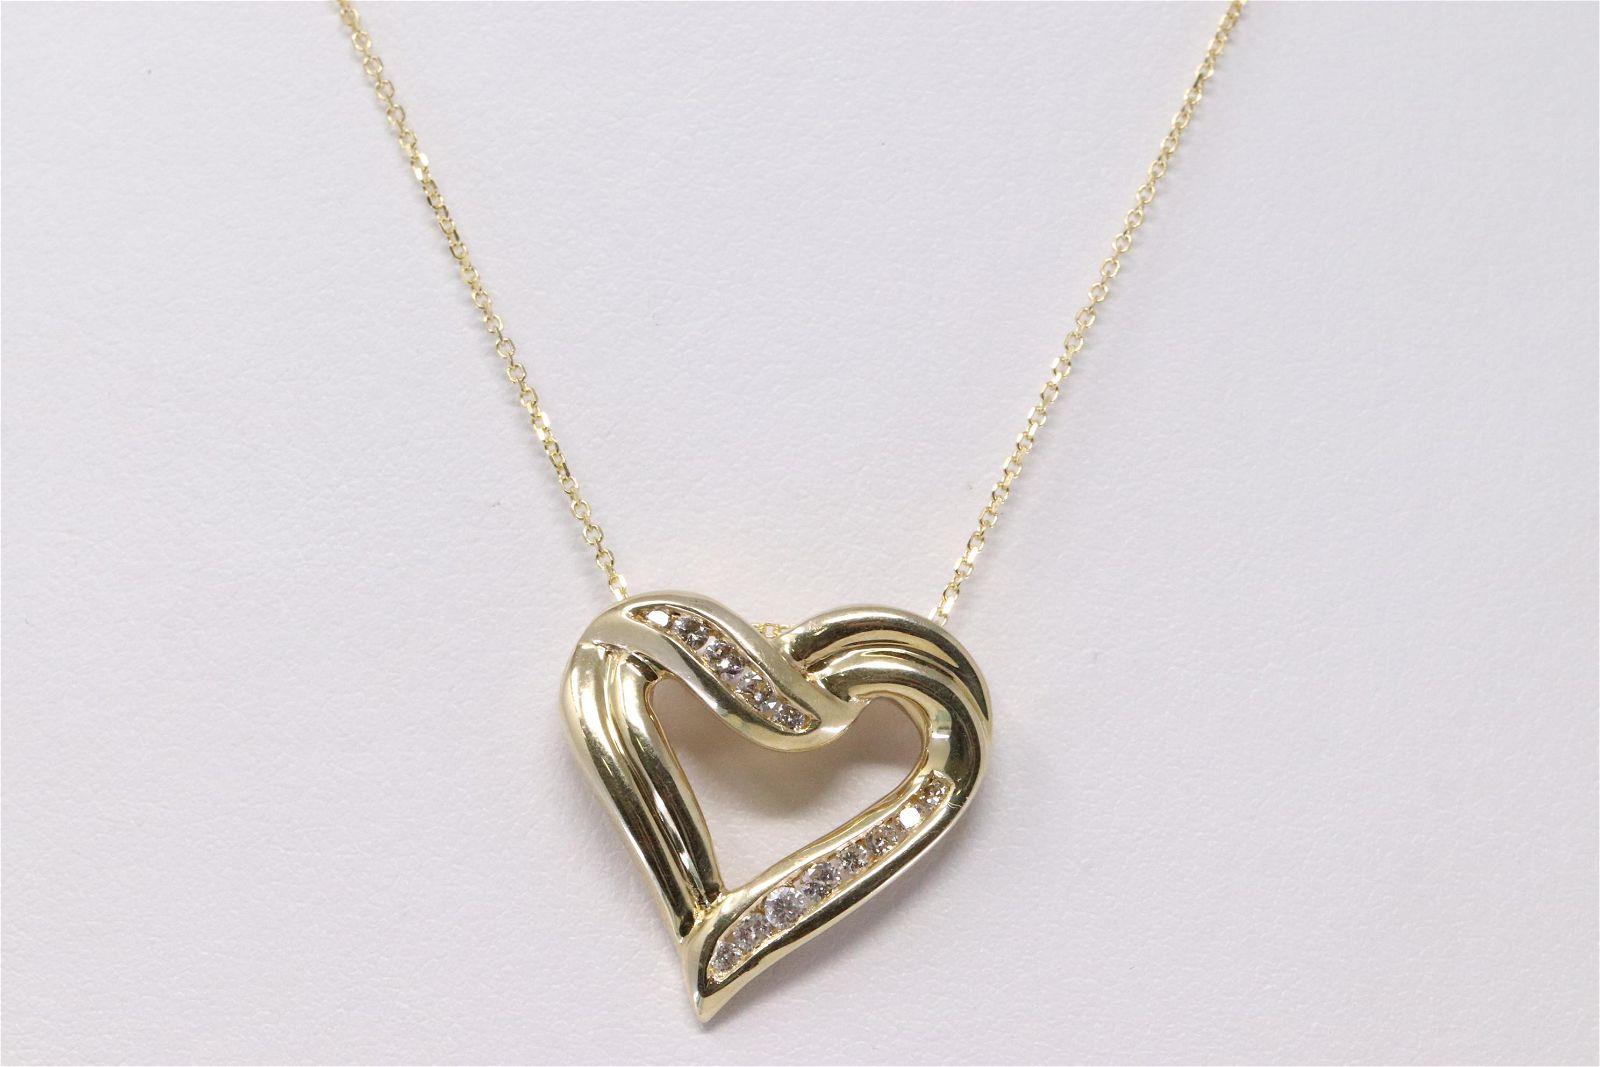 14Kt Yellow Gold Diamond Heart Pendant.